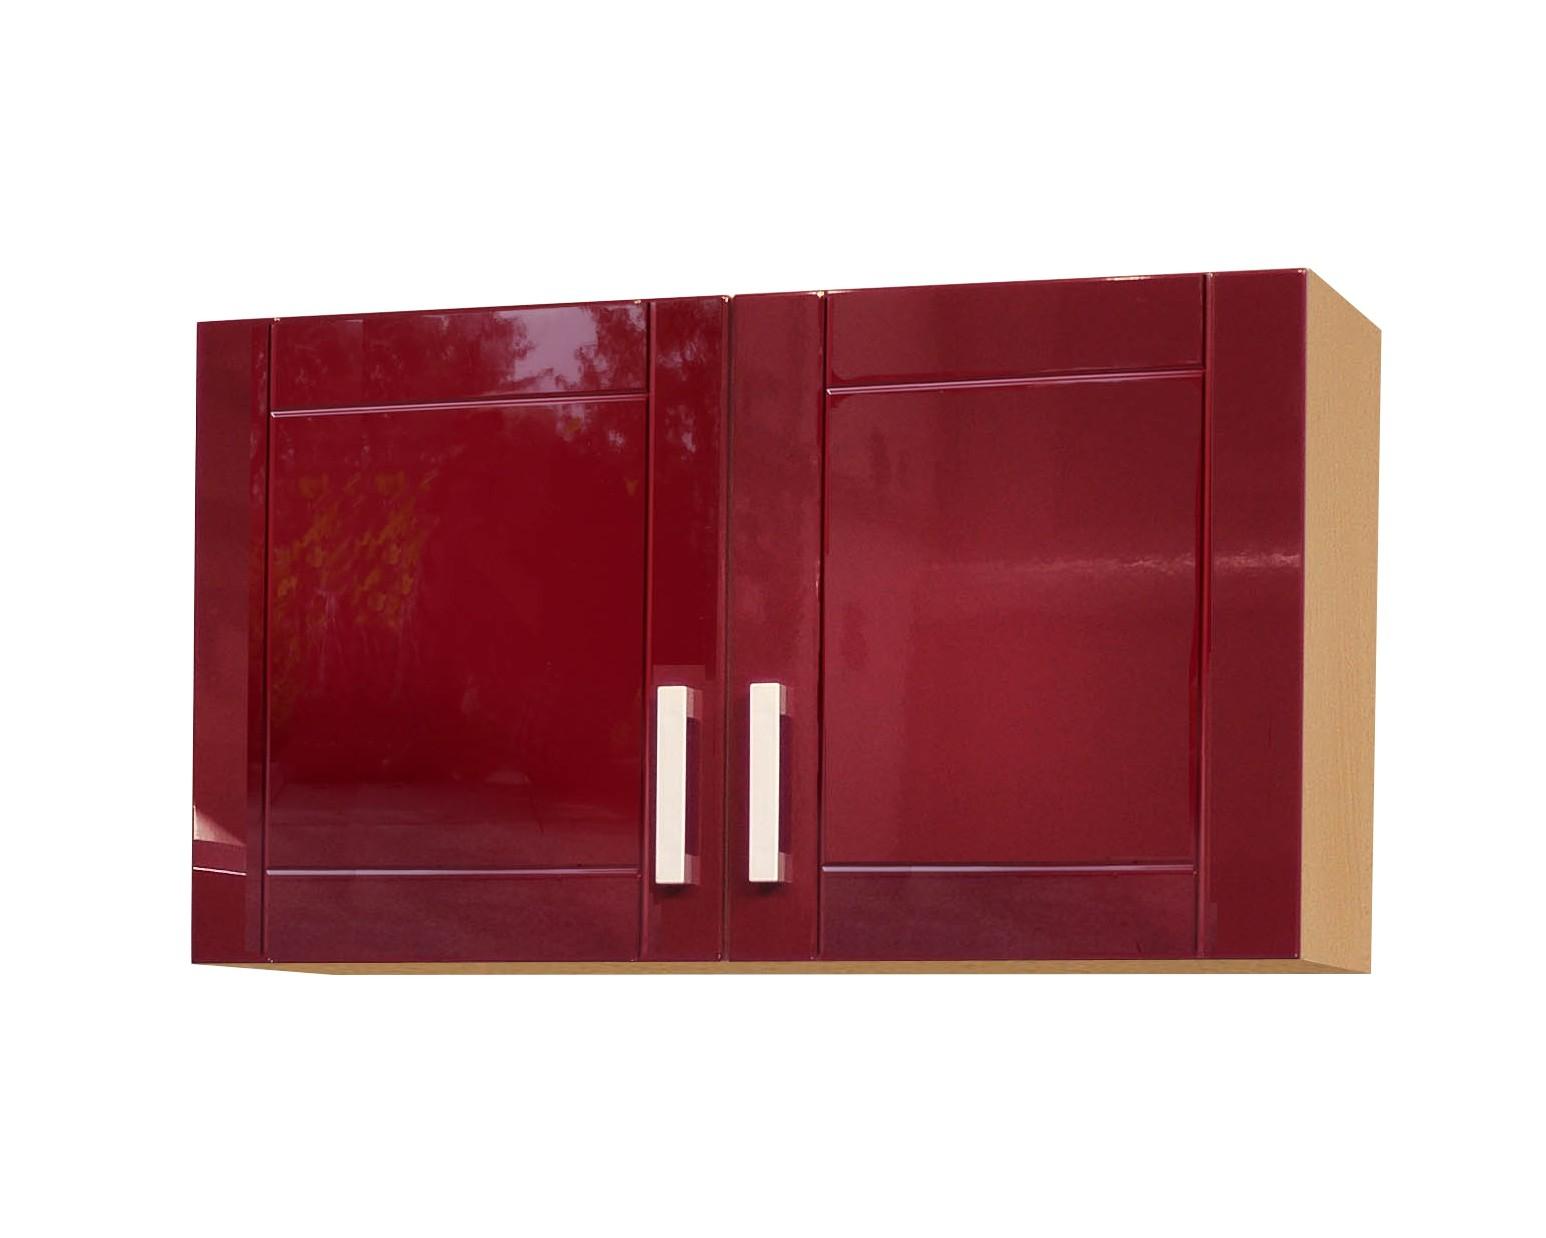 k chen h ngeschrank varel k chenschrank oberschrank 100cm hochglanz bordeaux rot ebay. Black Bedroom Furniture Sets. Home Design Ideas